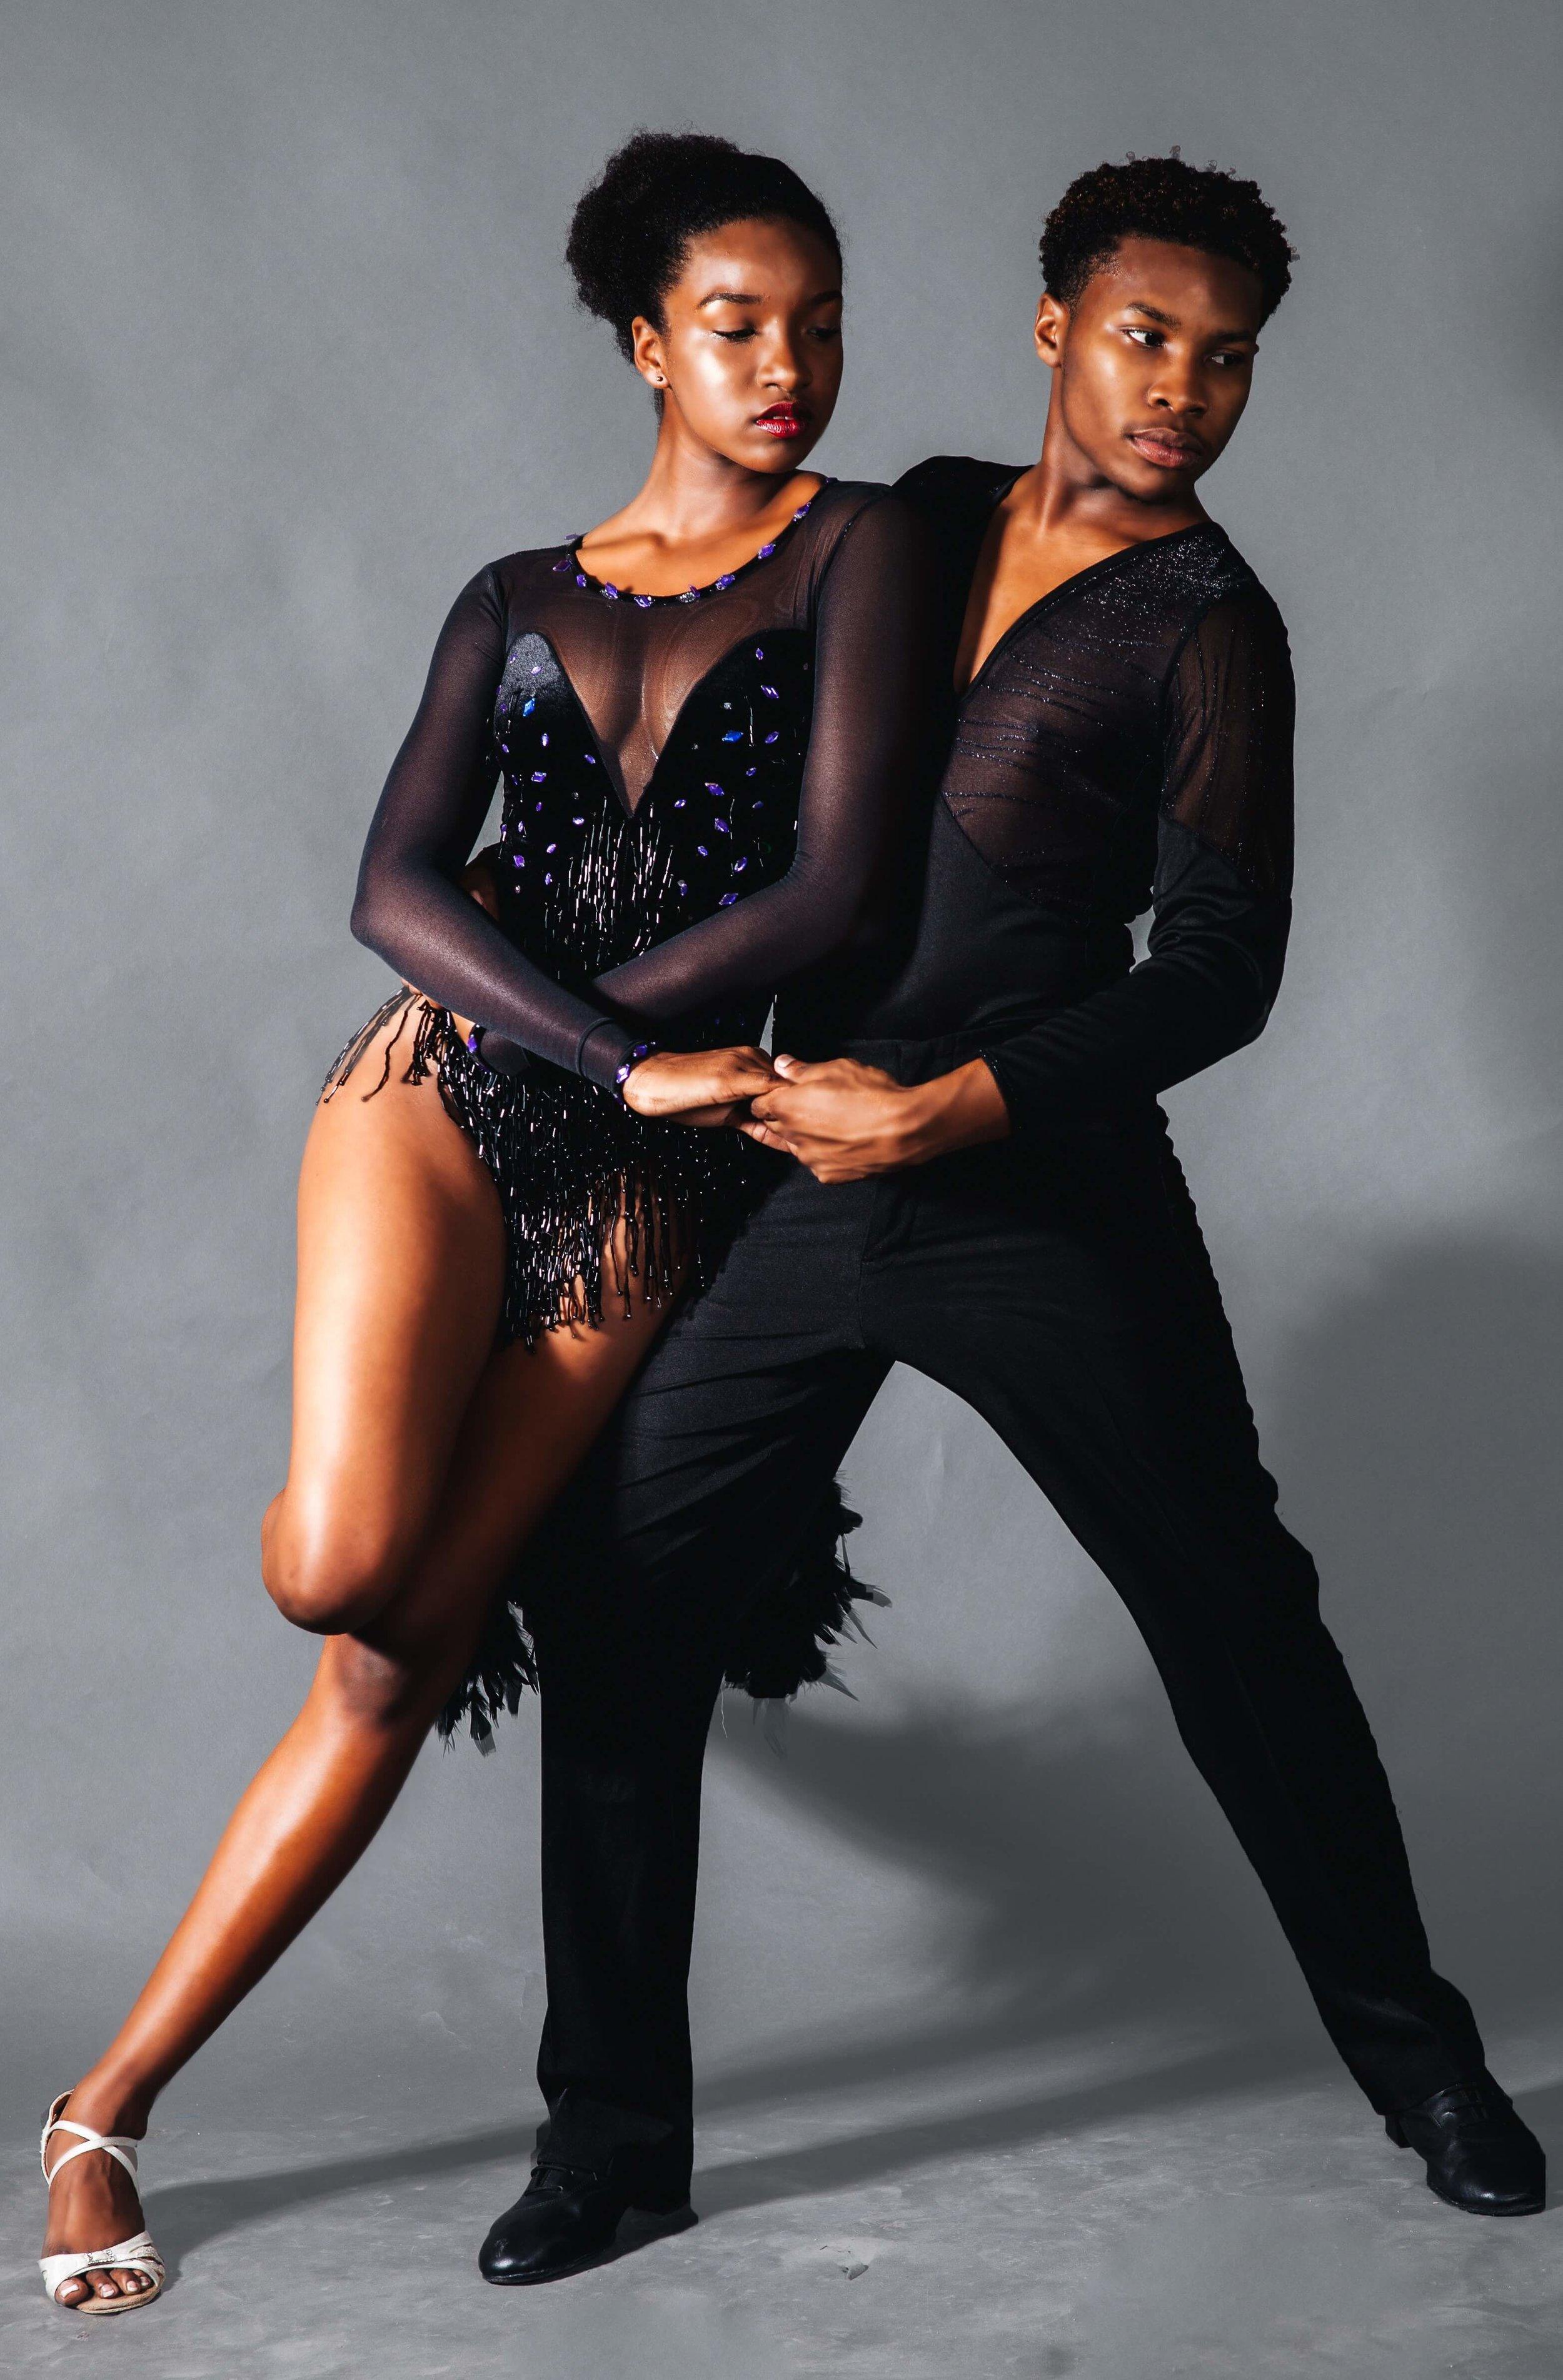 Confident ballroom dancers reaping the health benefits of ballroom dance classes